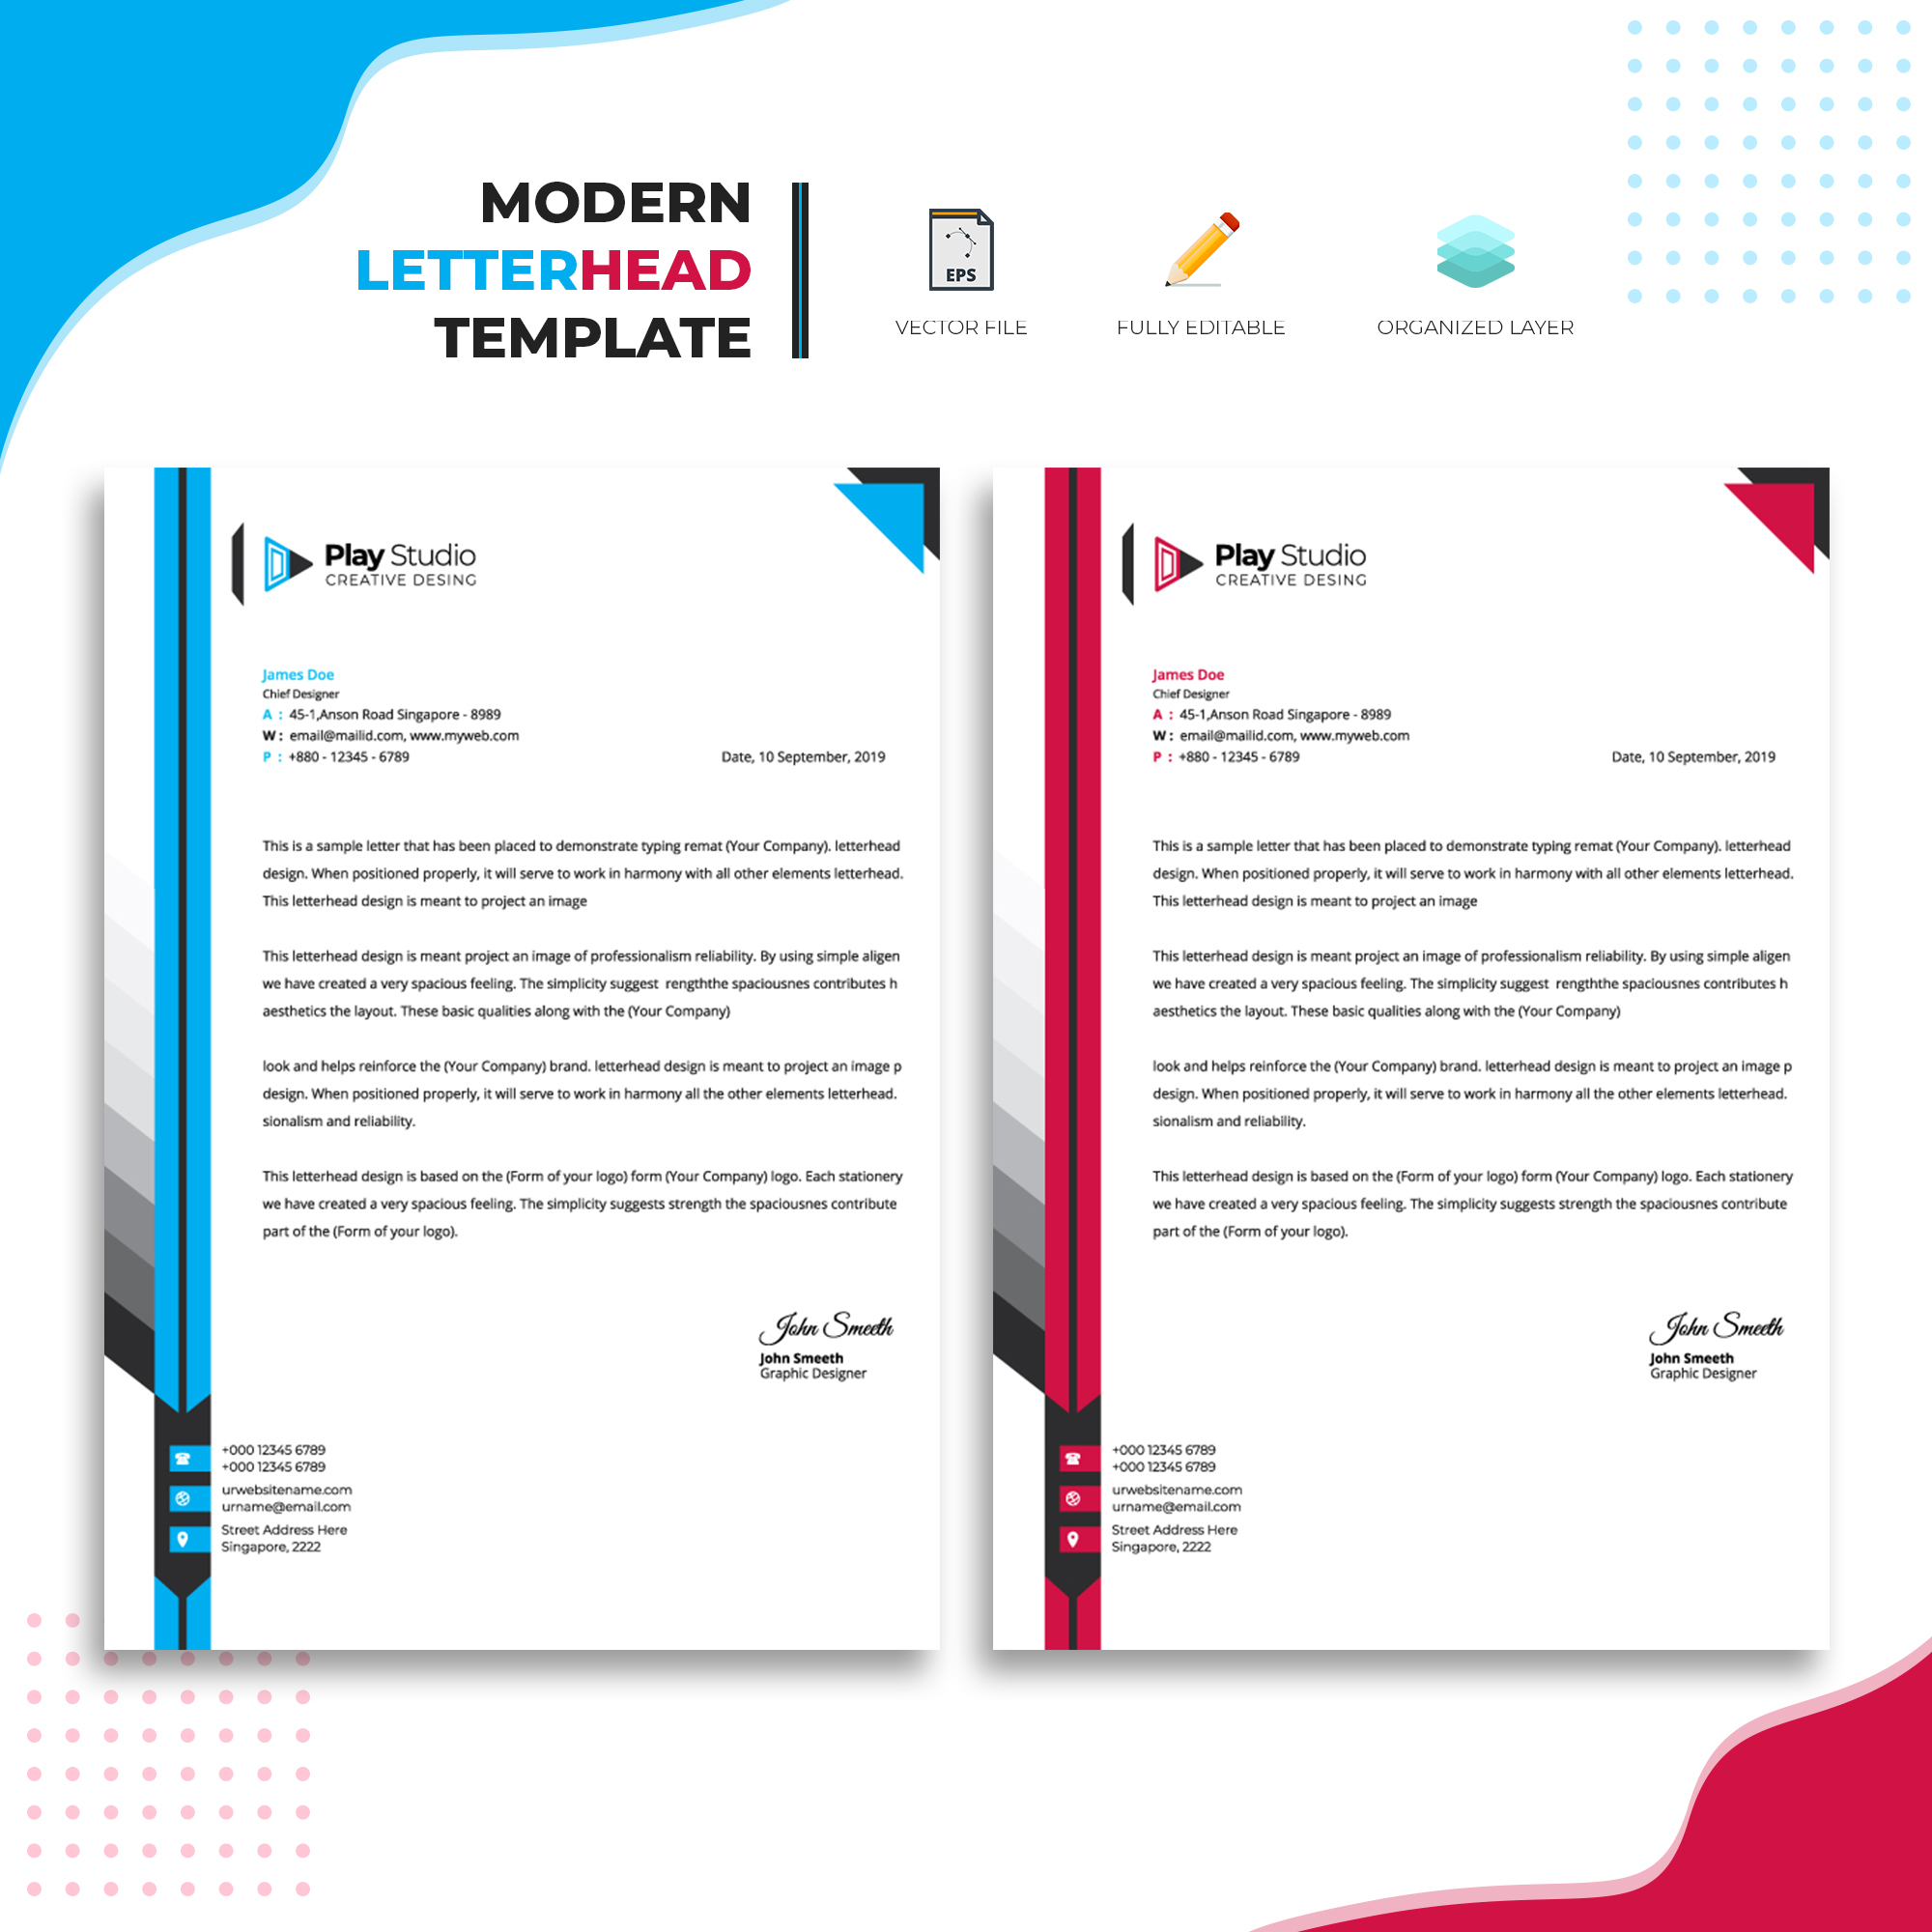 Modern Letterhead Template Design Download Free Vectors Clipart Graphics Vector Art,Memphis Interior Design